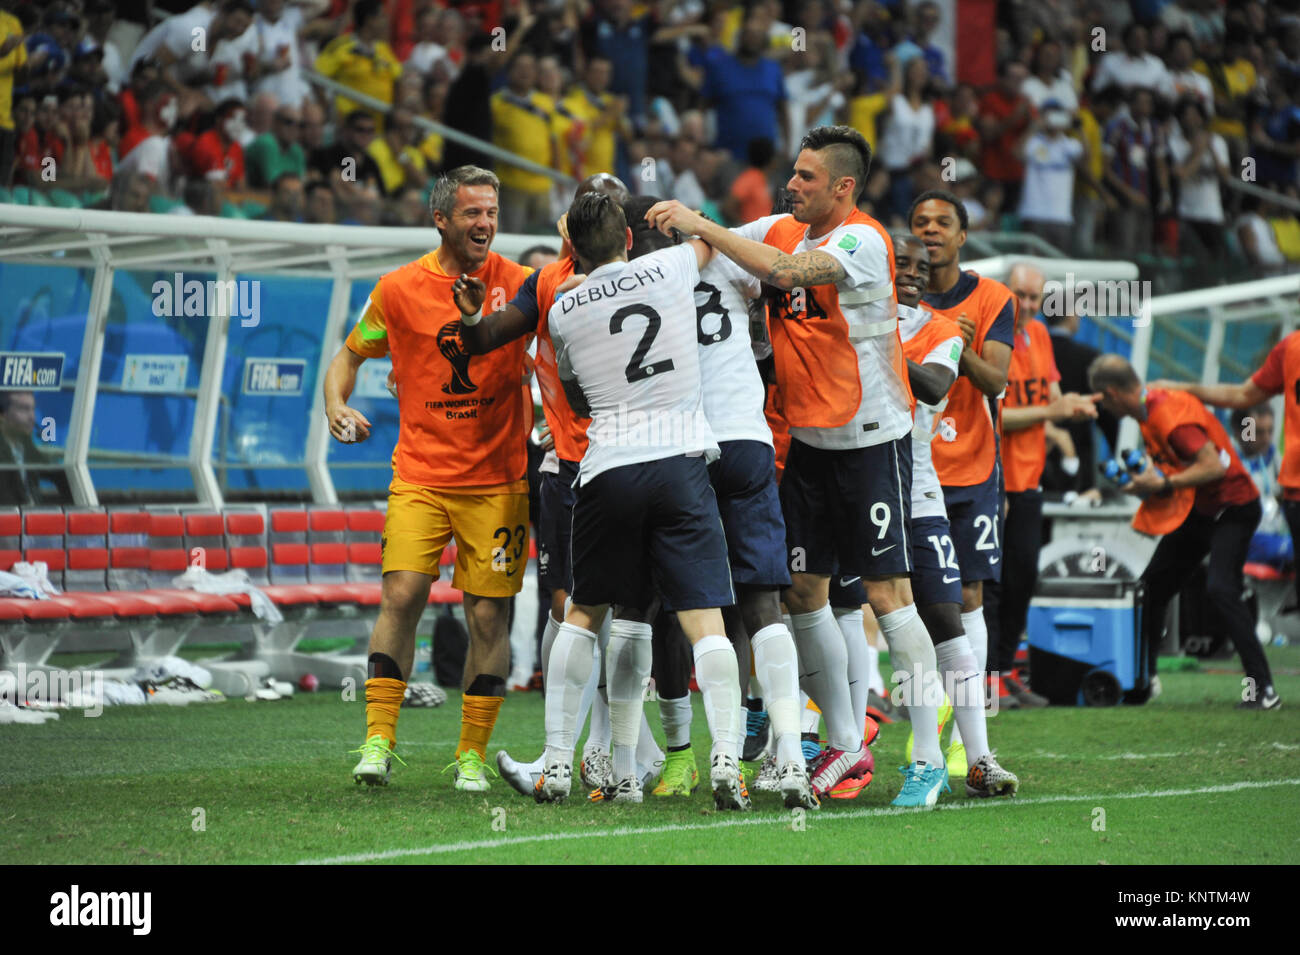 Fifa World Cup 2014, France vs. Switzerland, French Goal, Salvador da Bahia, Brazil - Stock Image